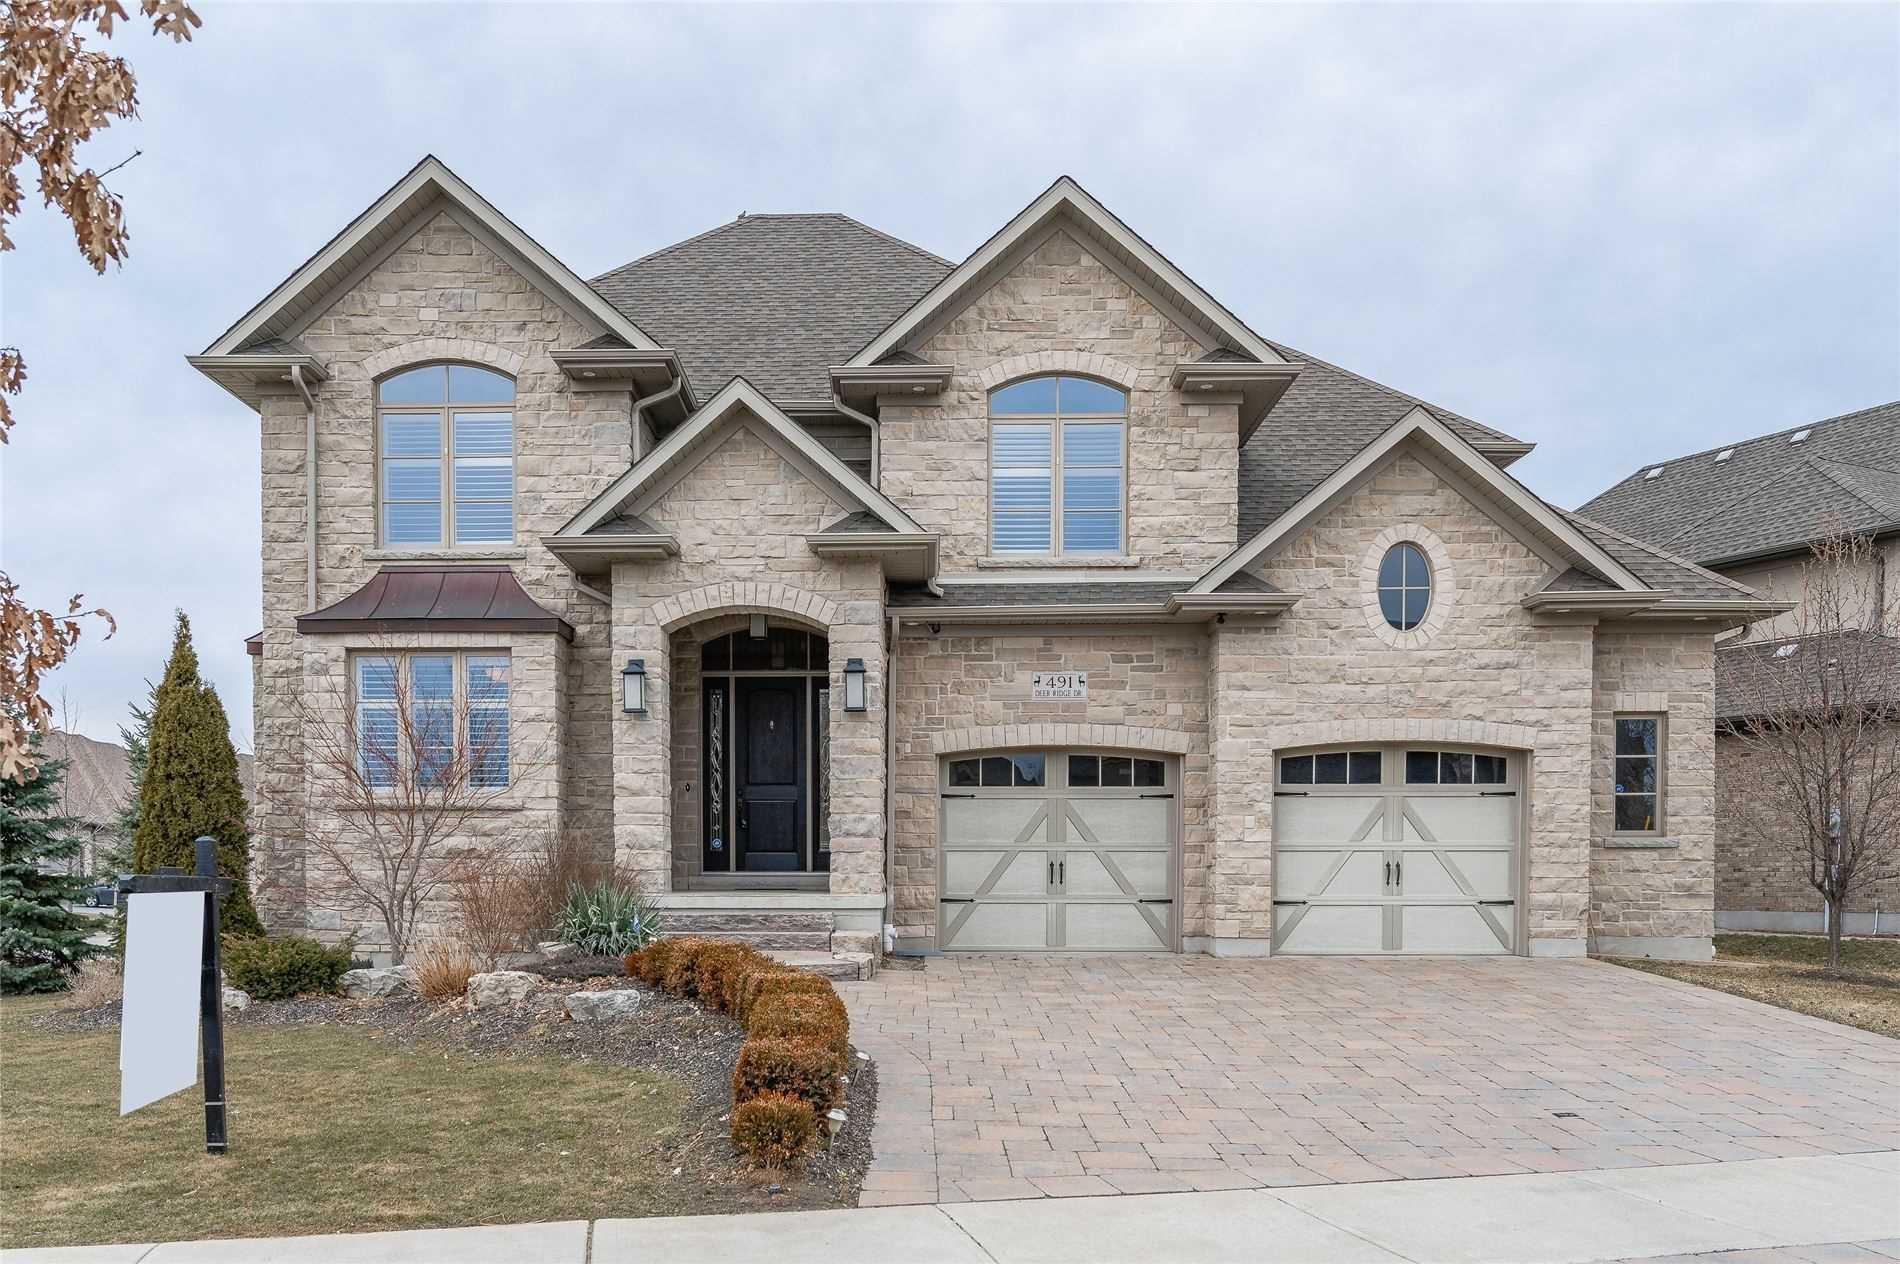 491 Deer Ridge Dr, Kitchener, Ontario N2P 0A7, 4 Bedrooms Bedrooms, 9 Rooms Rooms,5 BathroomsBathrooms,Detached,For Sale,Deer Ridge,X5158856